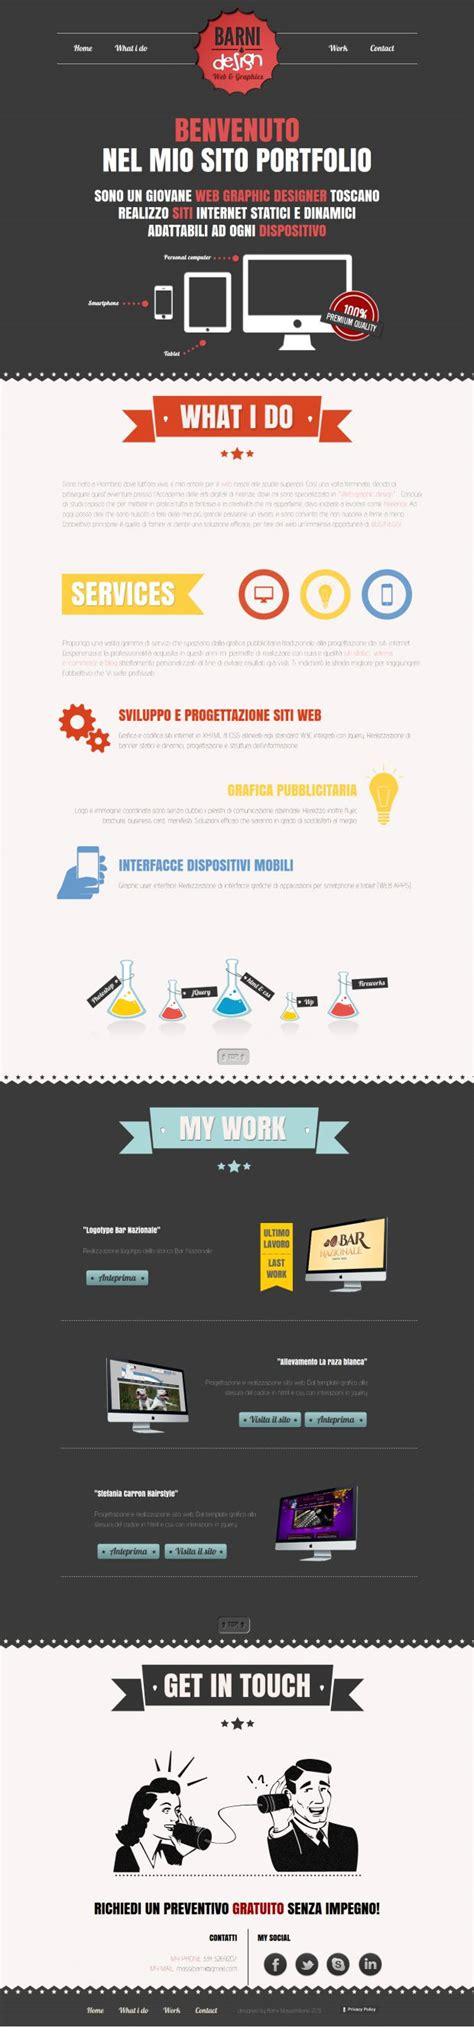 design freelance websites barni design freelance web designer and graphic design